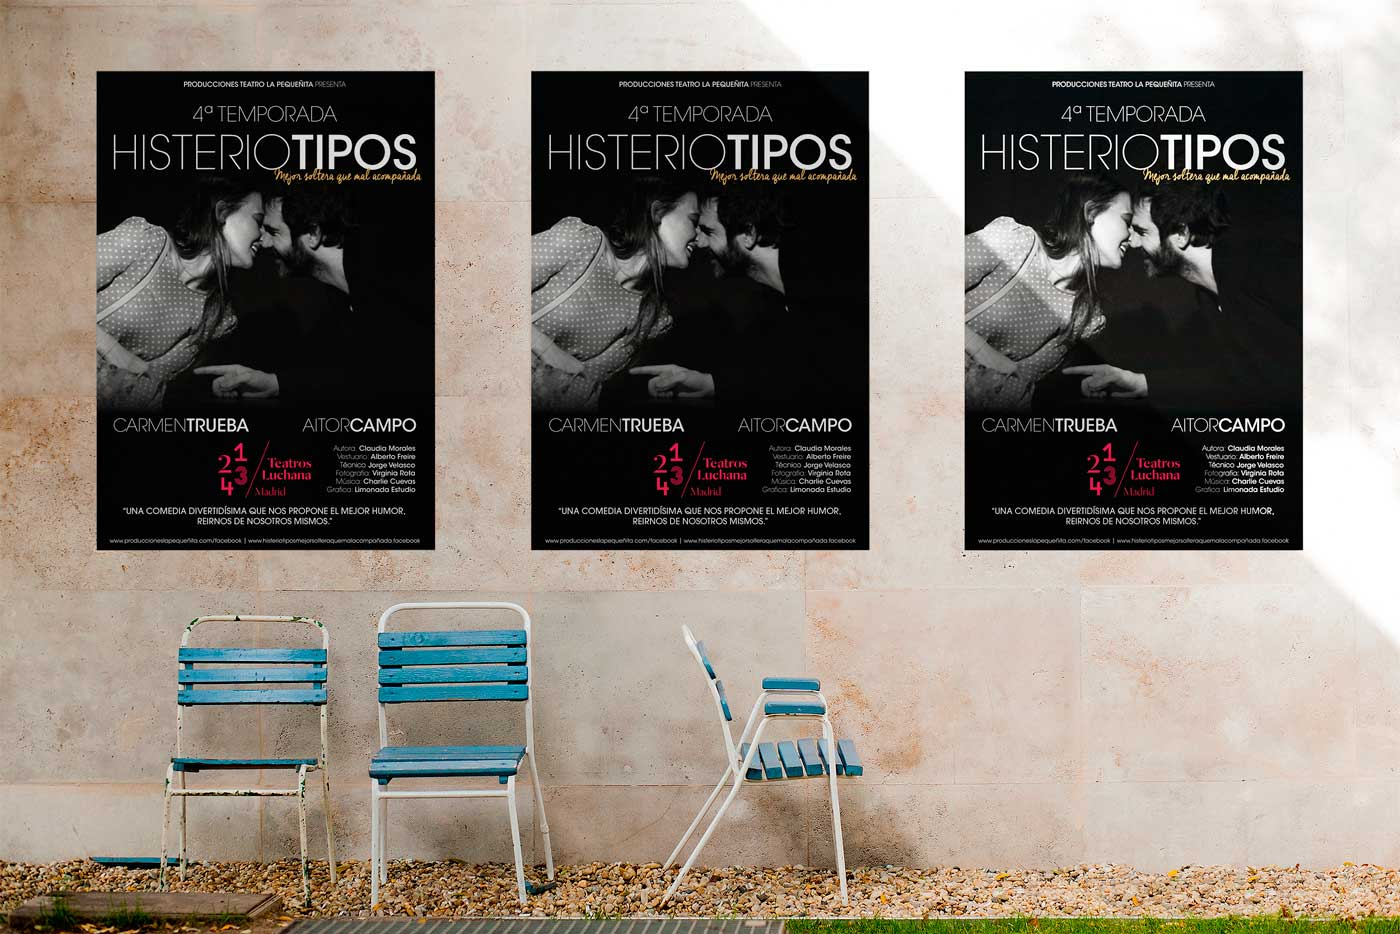 Poster Histeriotipos - Teatros LUCHANA Madrid